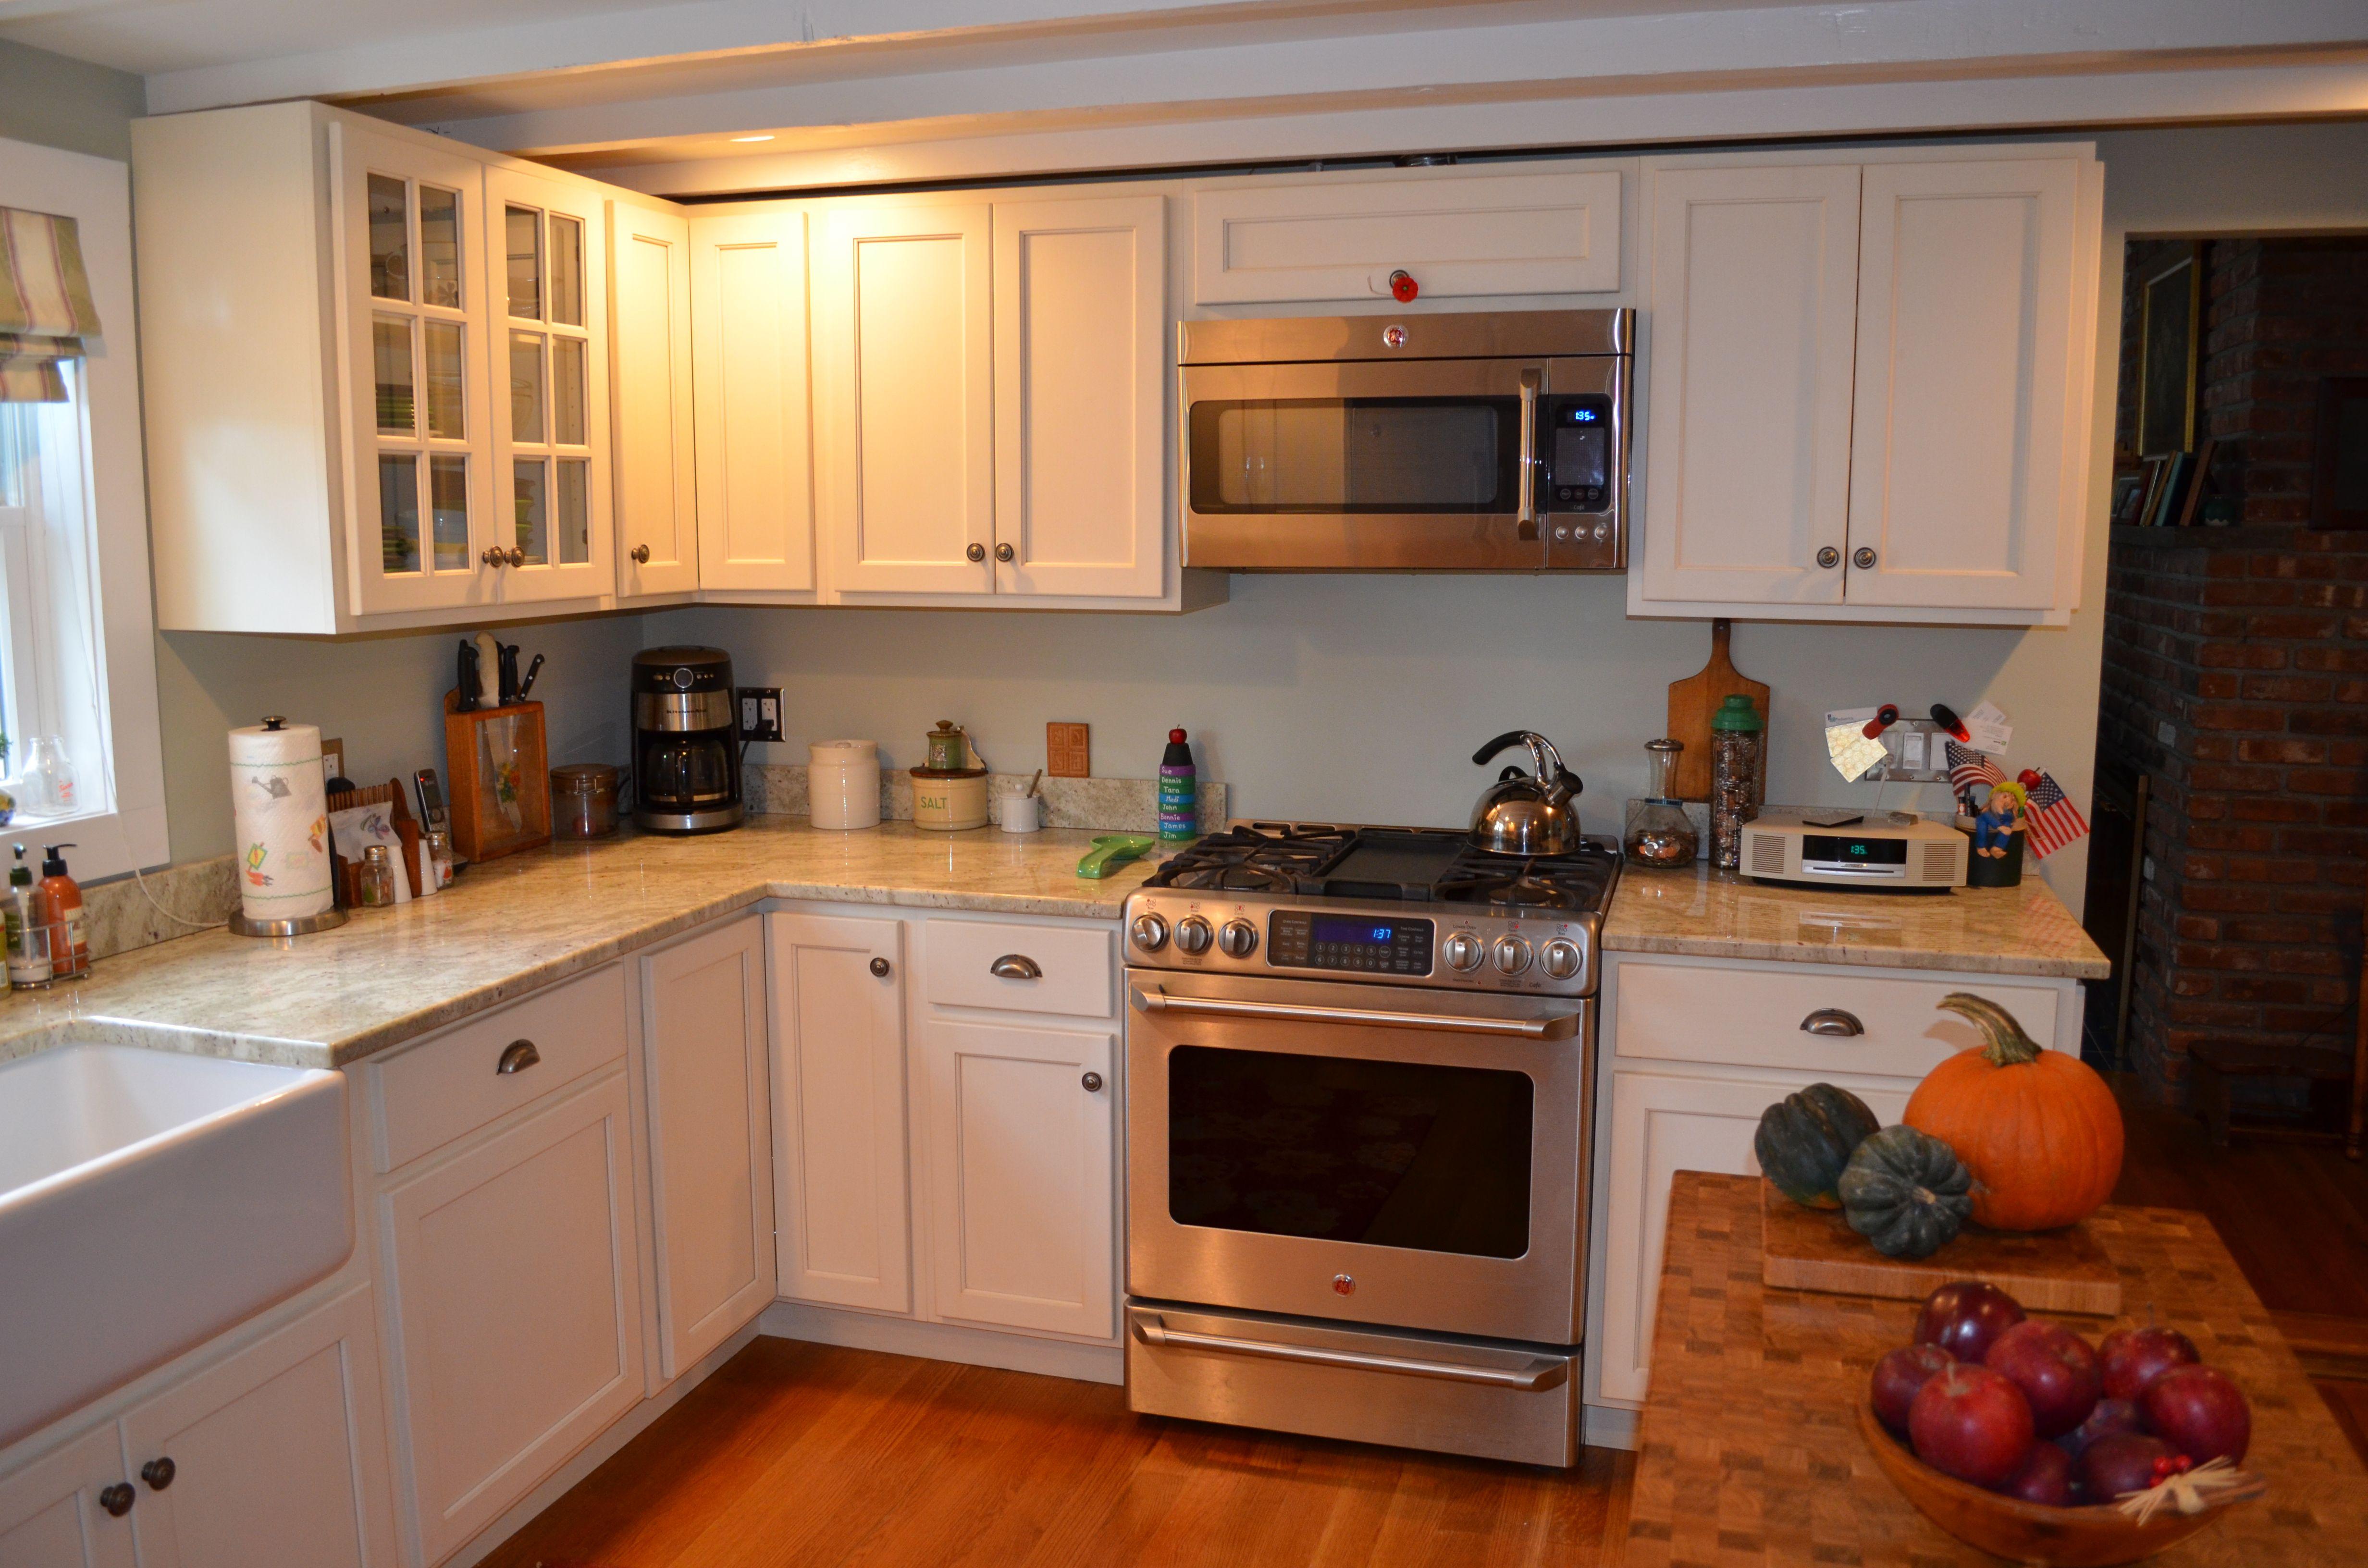 majestic kitchens bath designer roberto leira cabico cabinetry